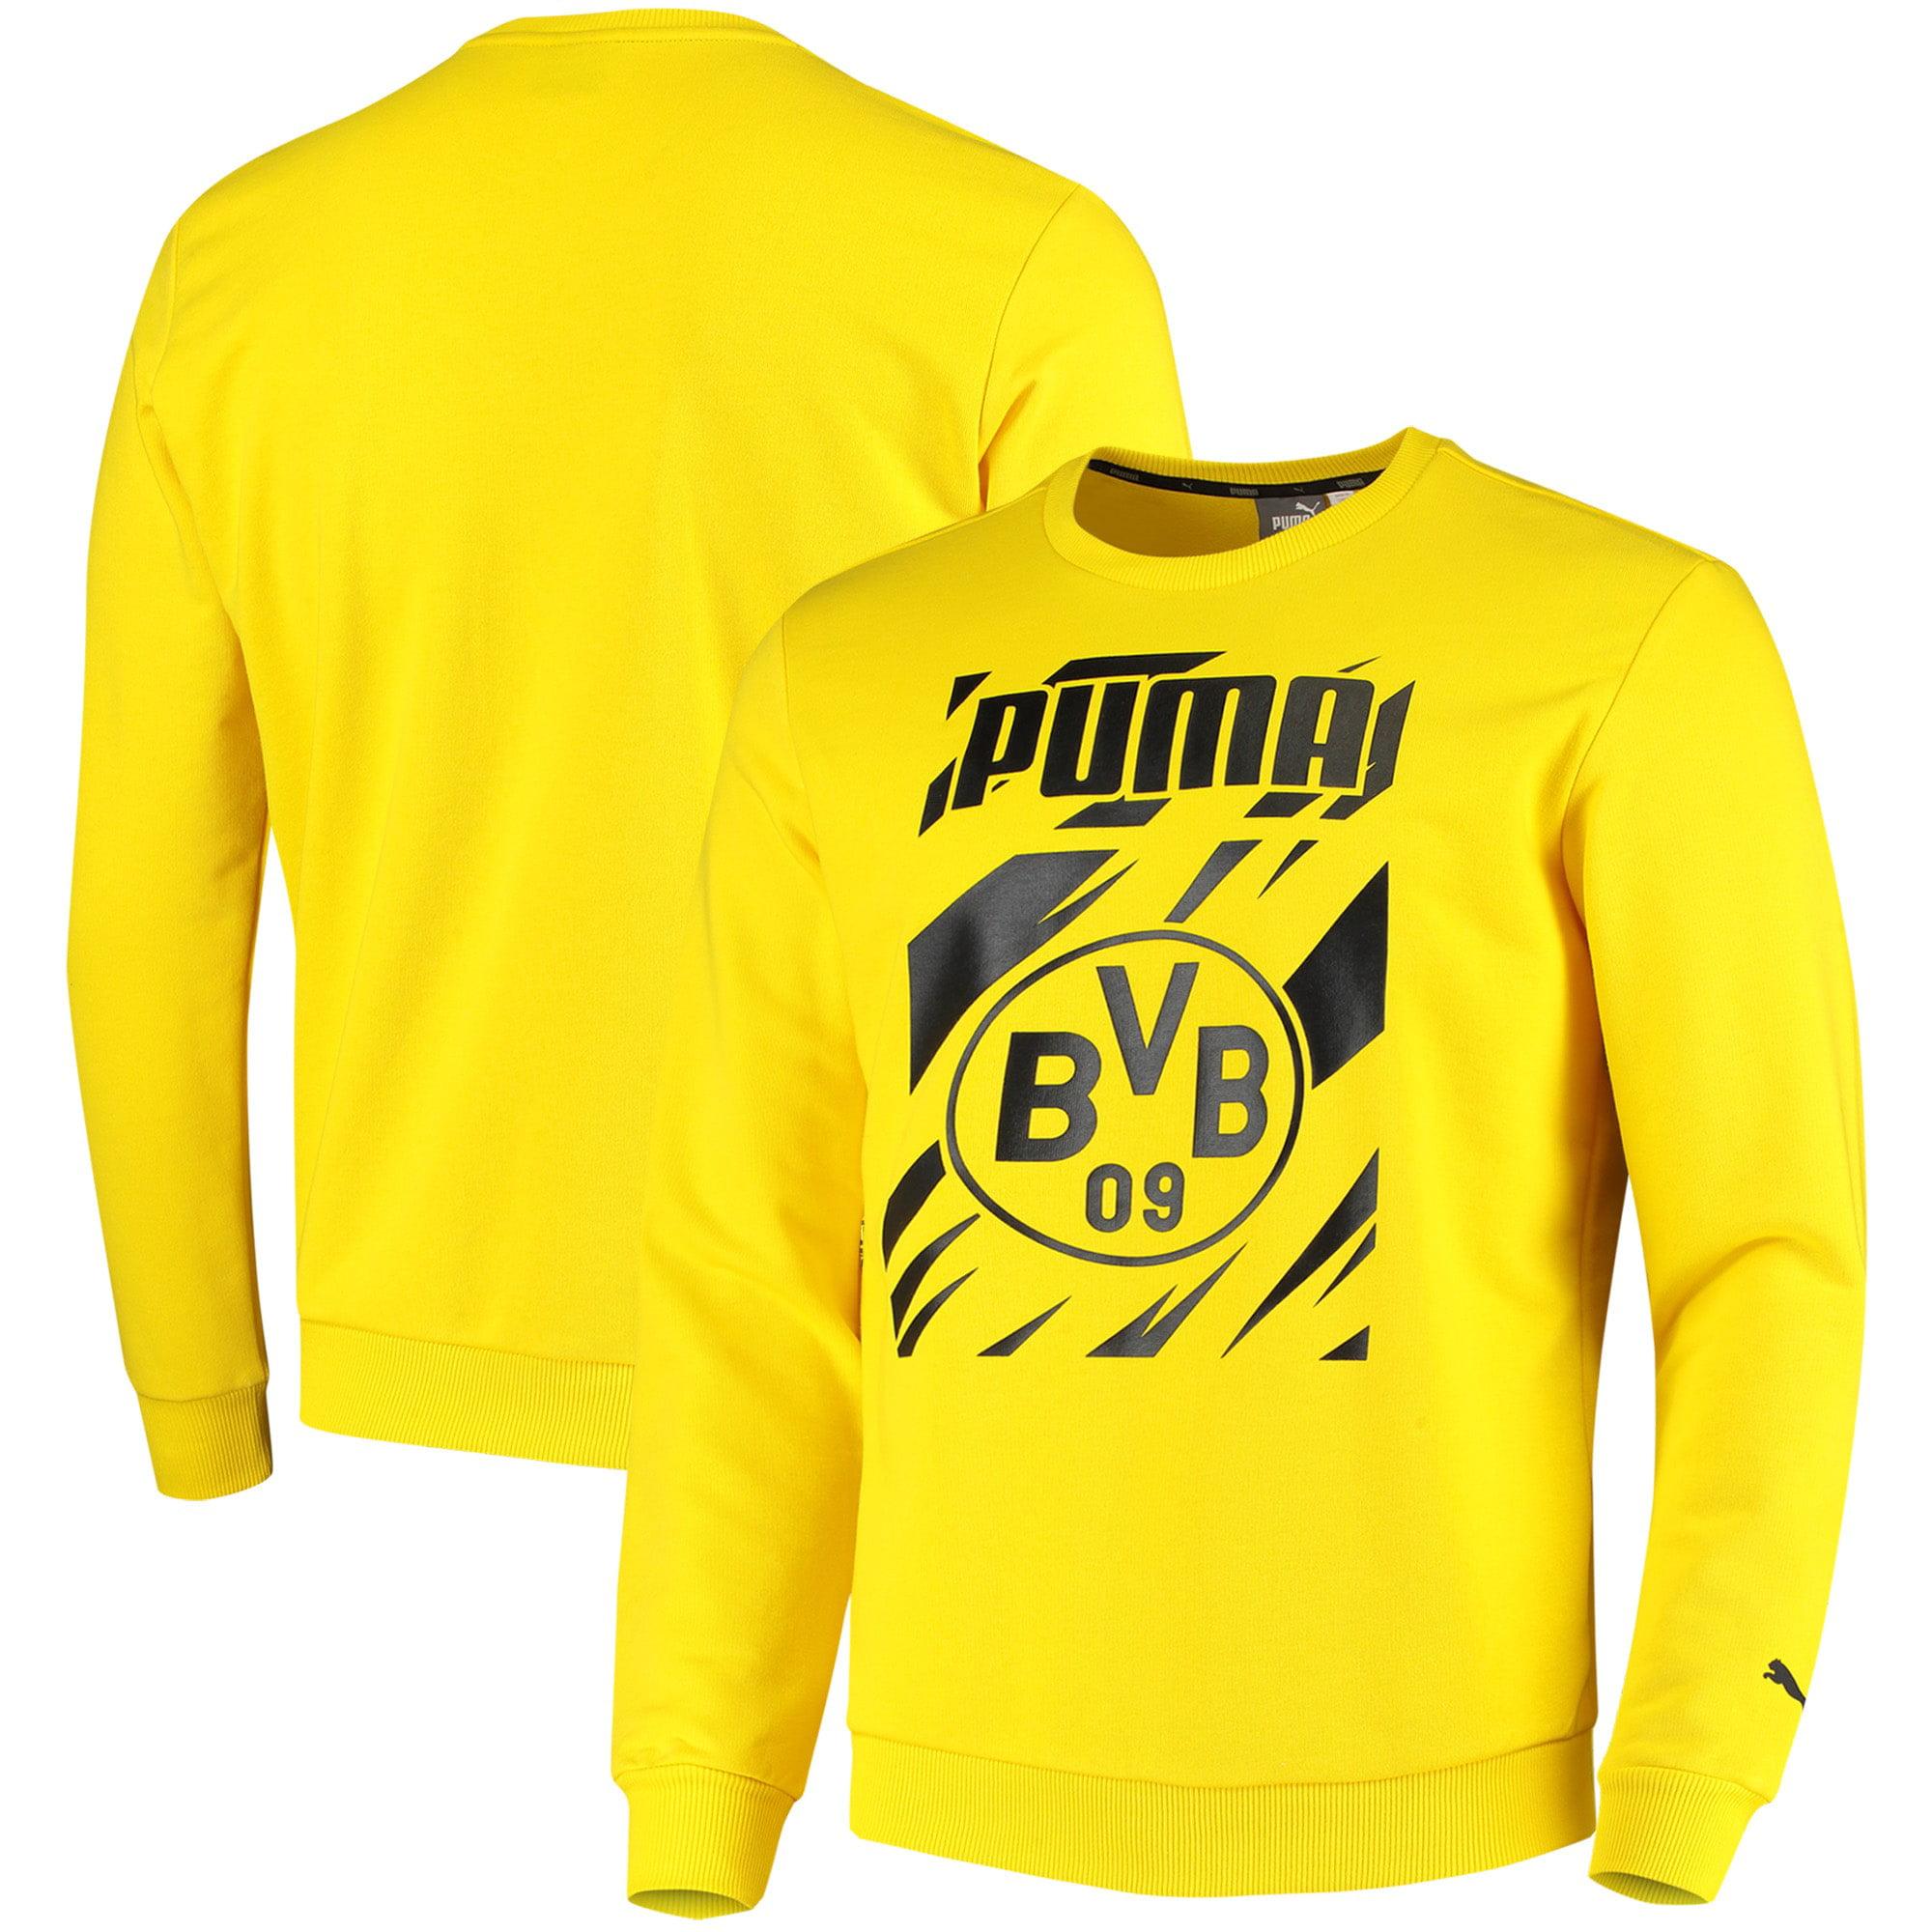 PUMA - Borussia Dortmund Puma ftblCORE Pullover Sweatshirt - Yellow - Walmart.com